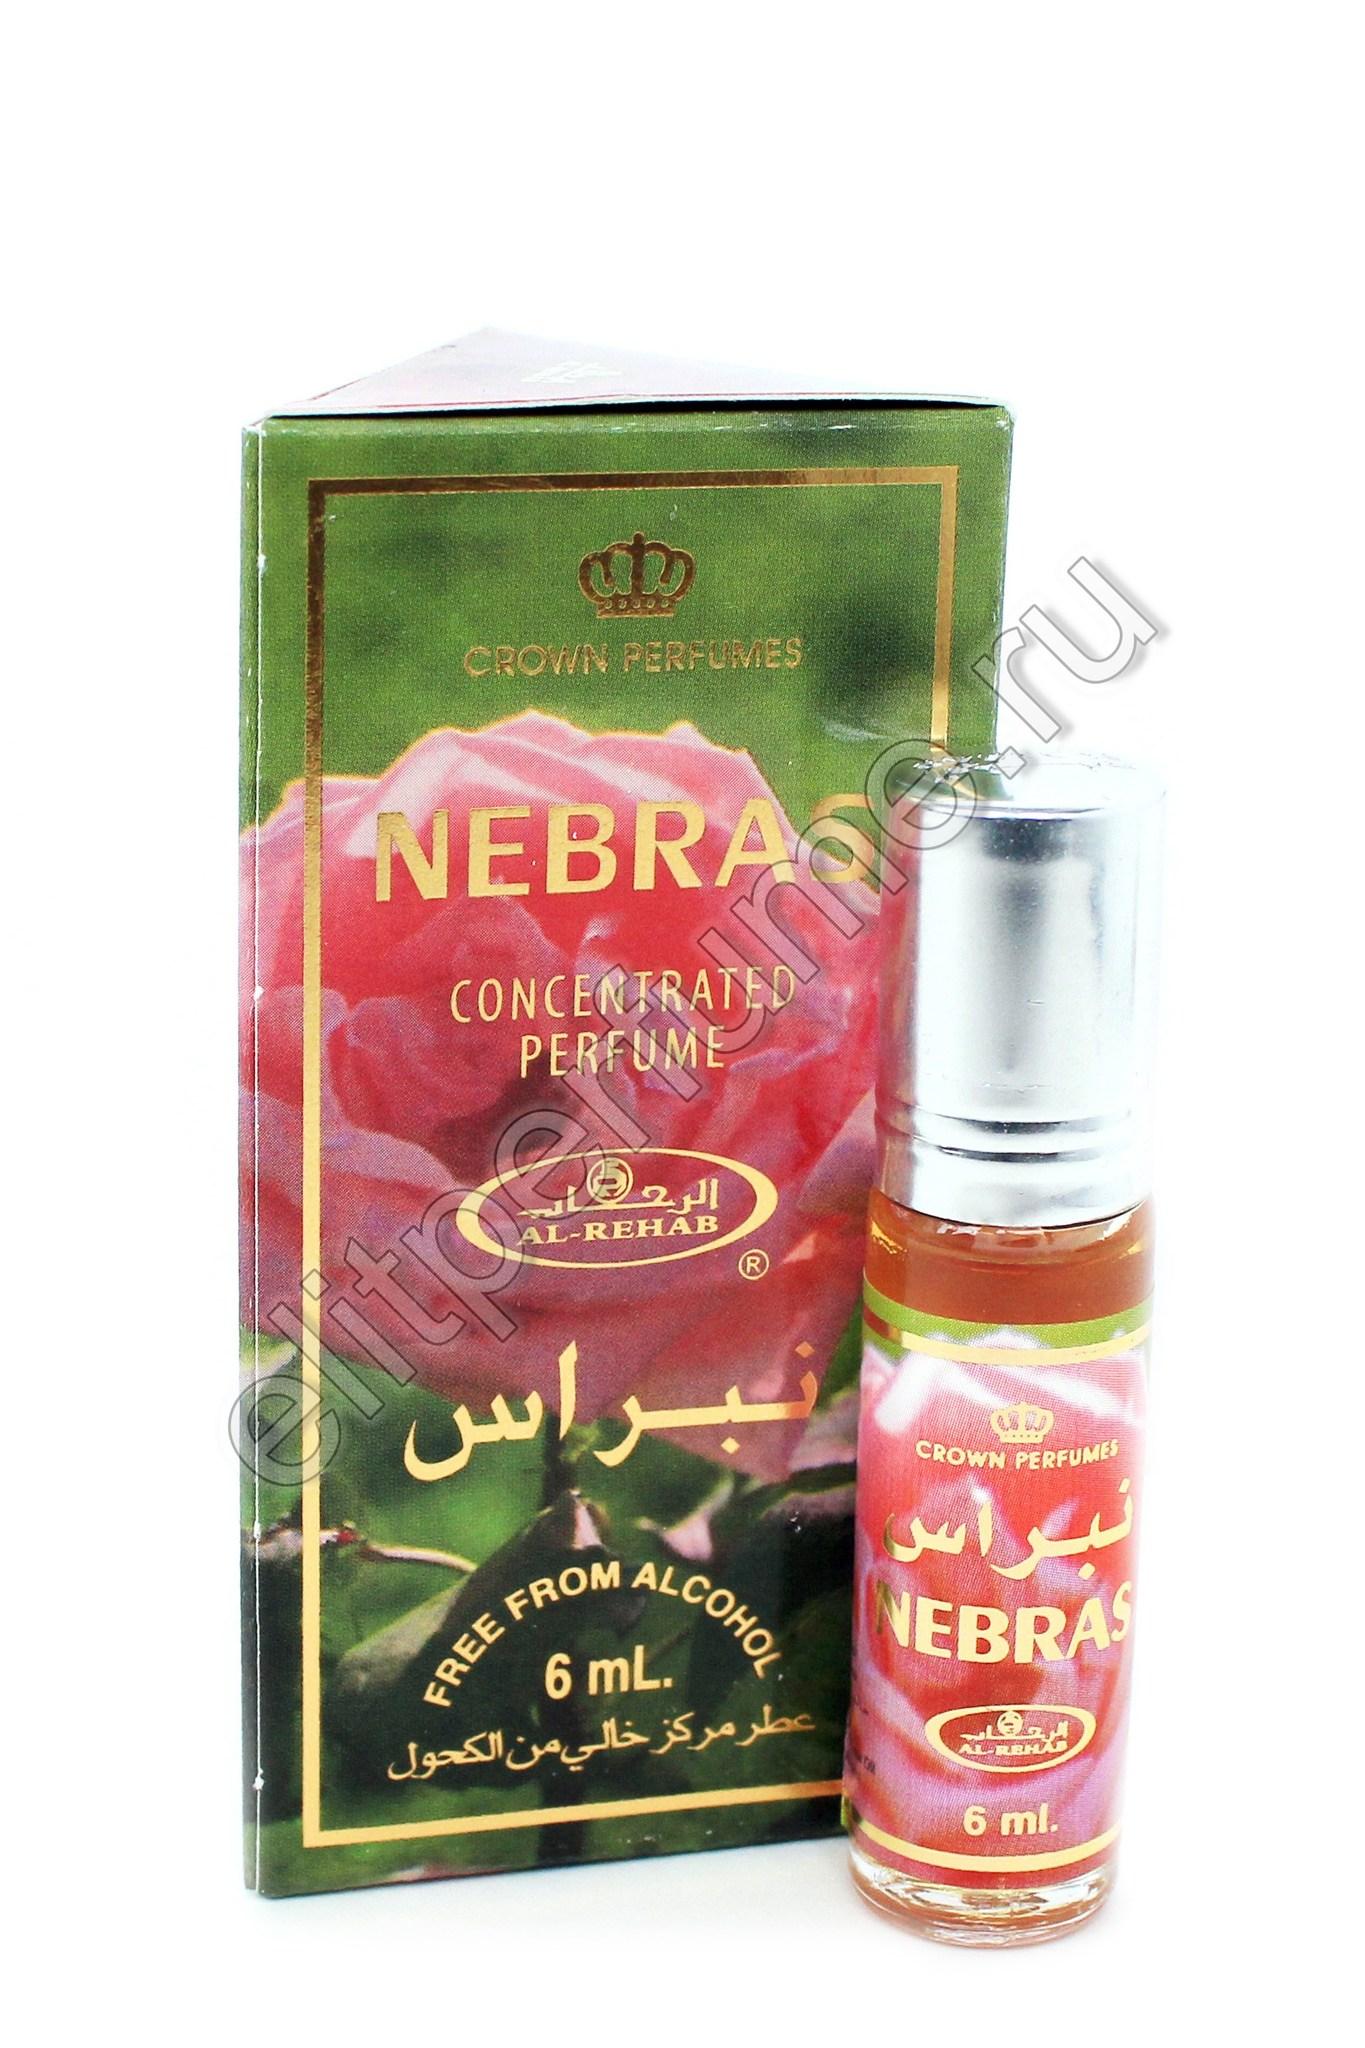 Nebras Небрас 6 мл арабские масляные духи от Аль Рехаб Al Rehab